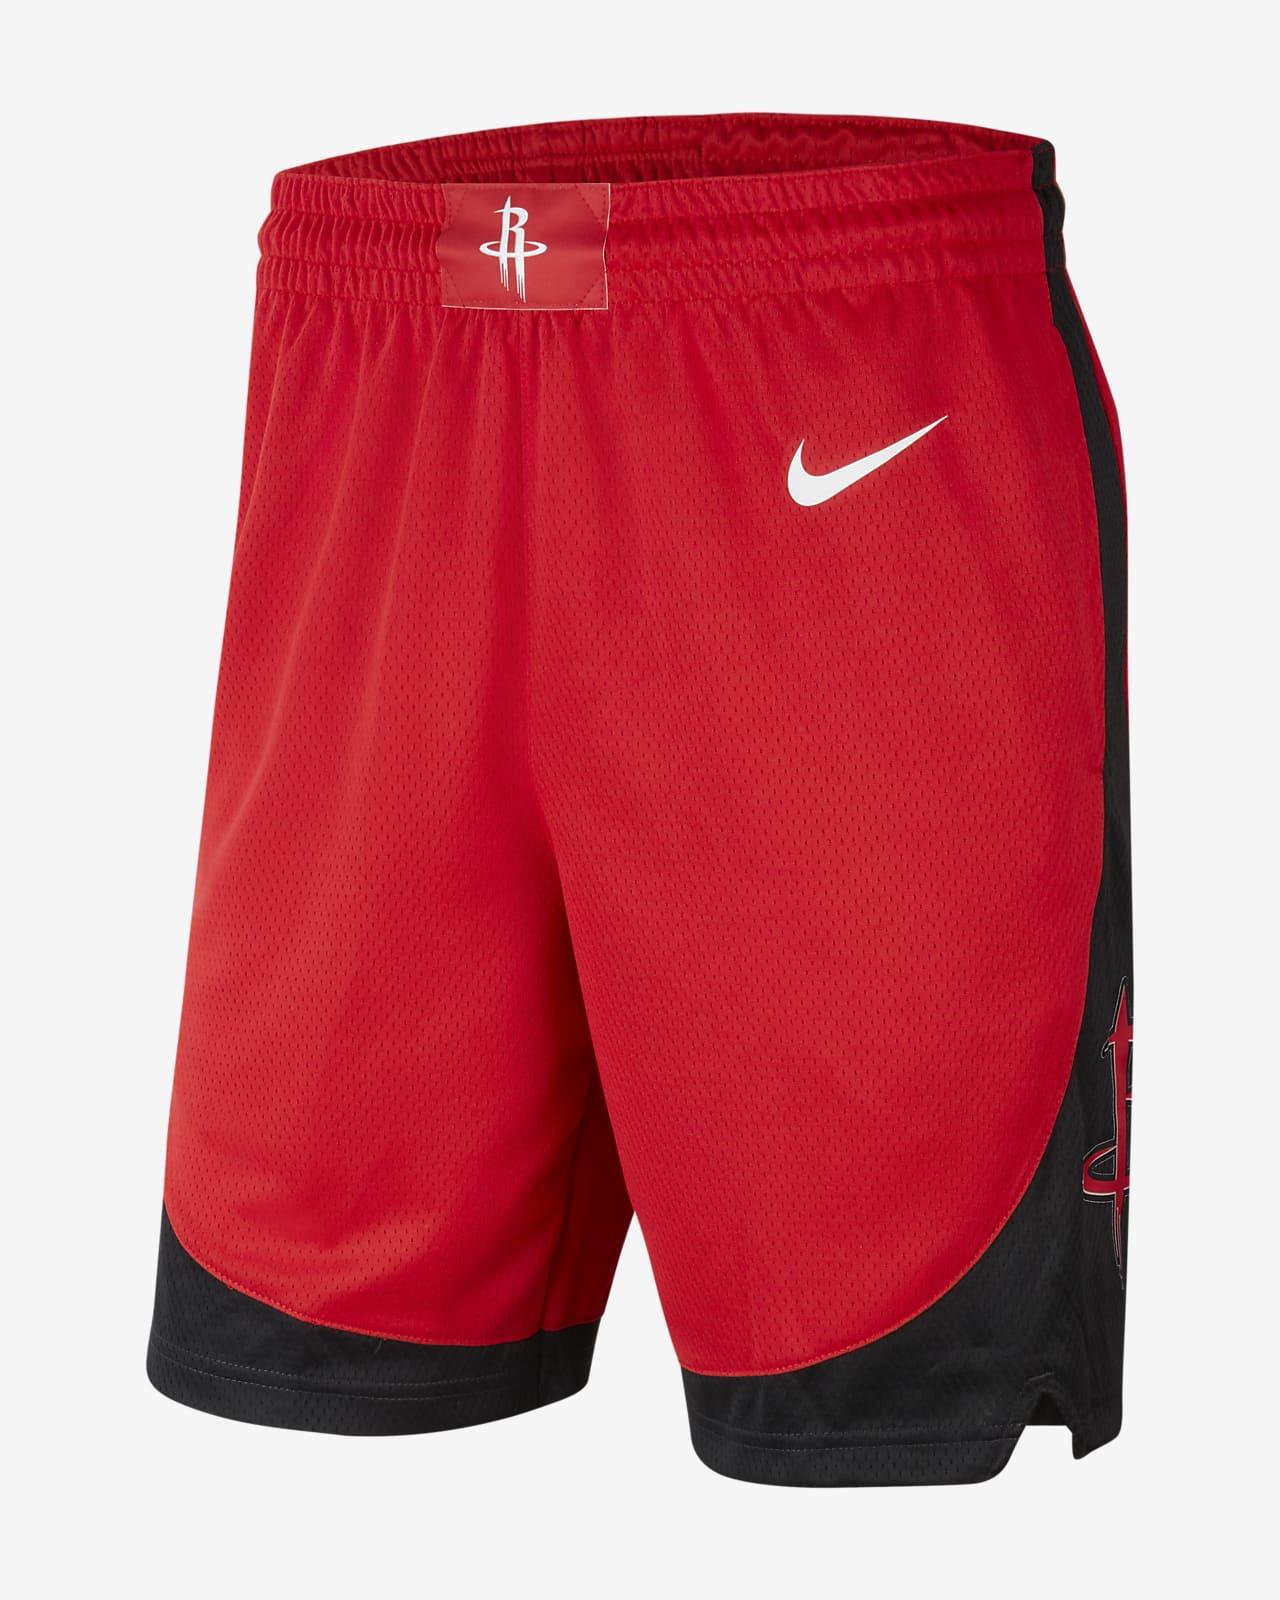 Houston Rockets Icon Edition Swingman Men's Nike NBA Shorts